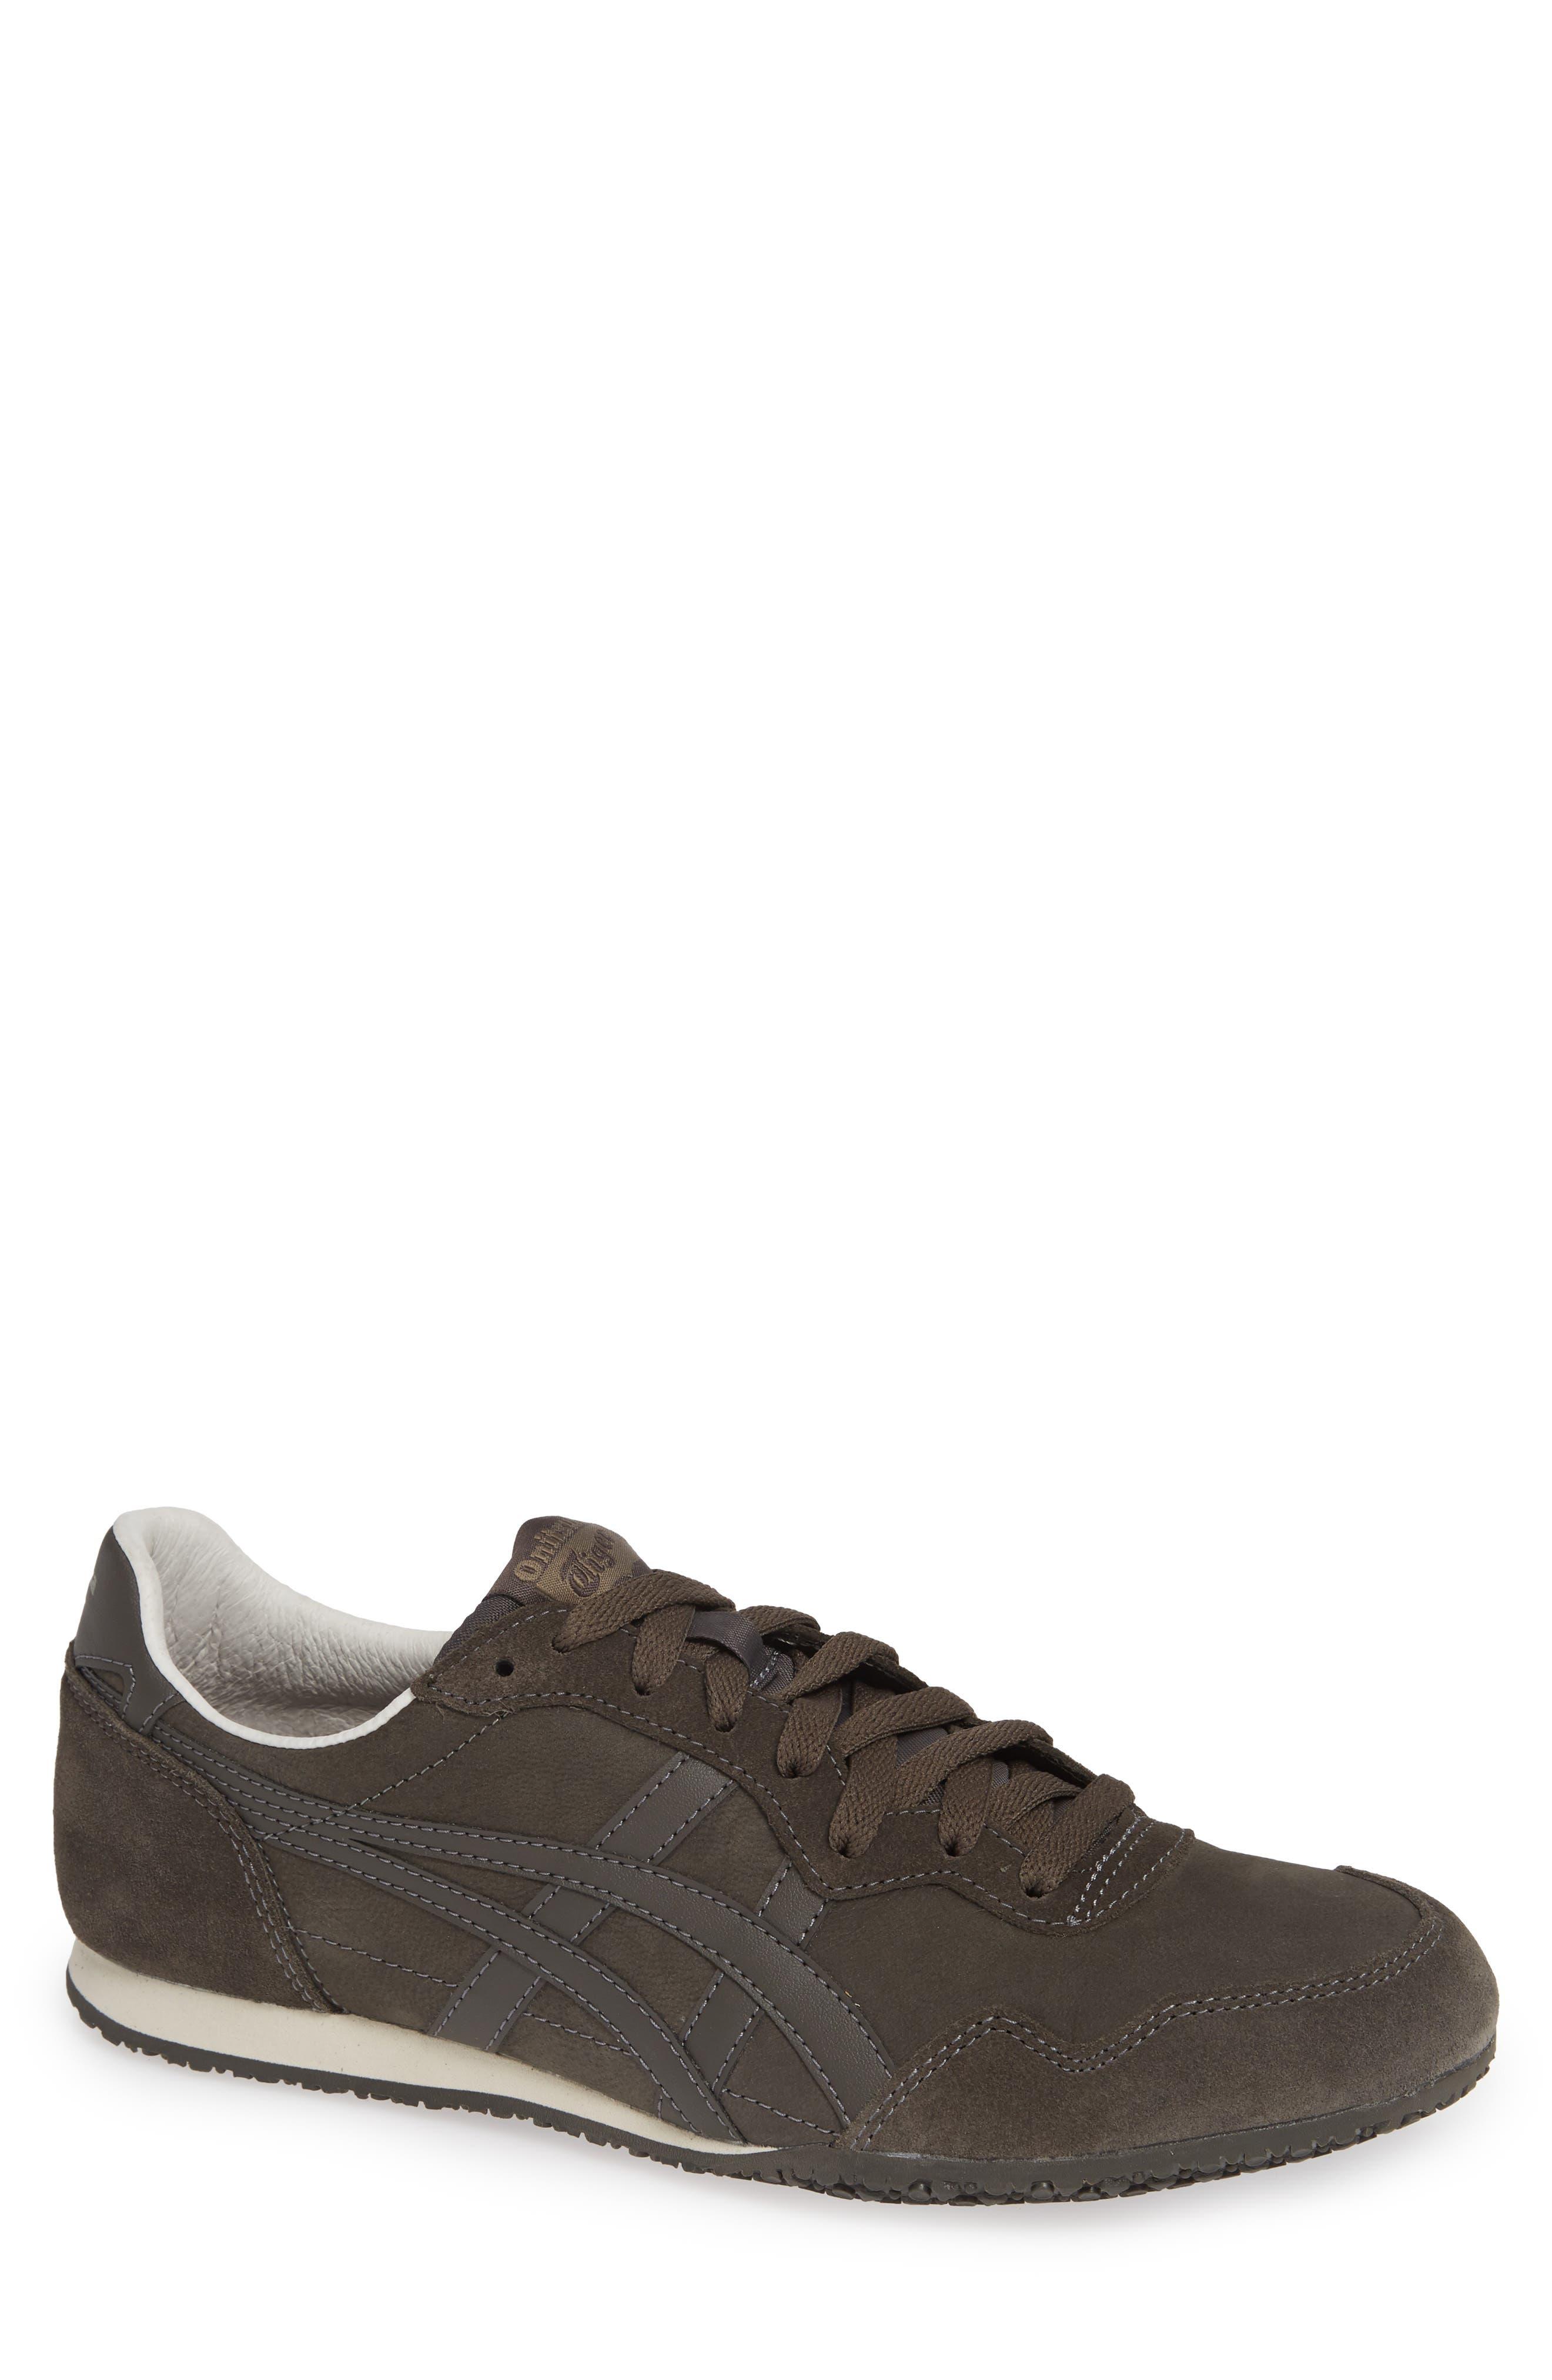 'Serrano' Sneaker,                             Main thumbnail 1, color,                             035